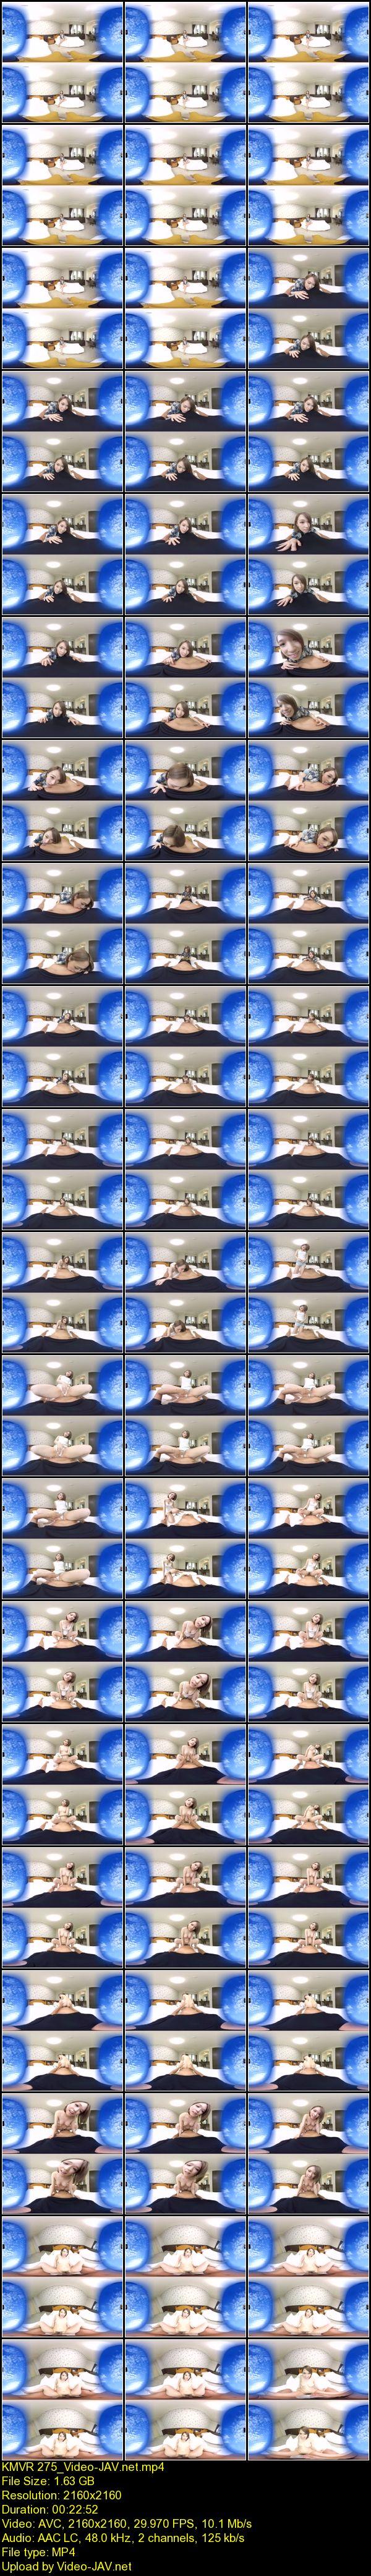 KMVR_275_Video-JAV.net.mp4.scrlist.jpg